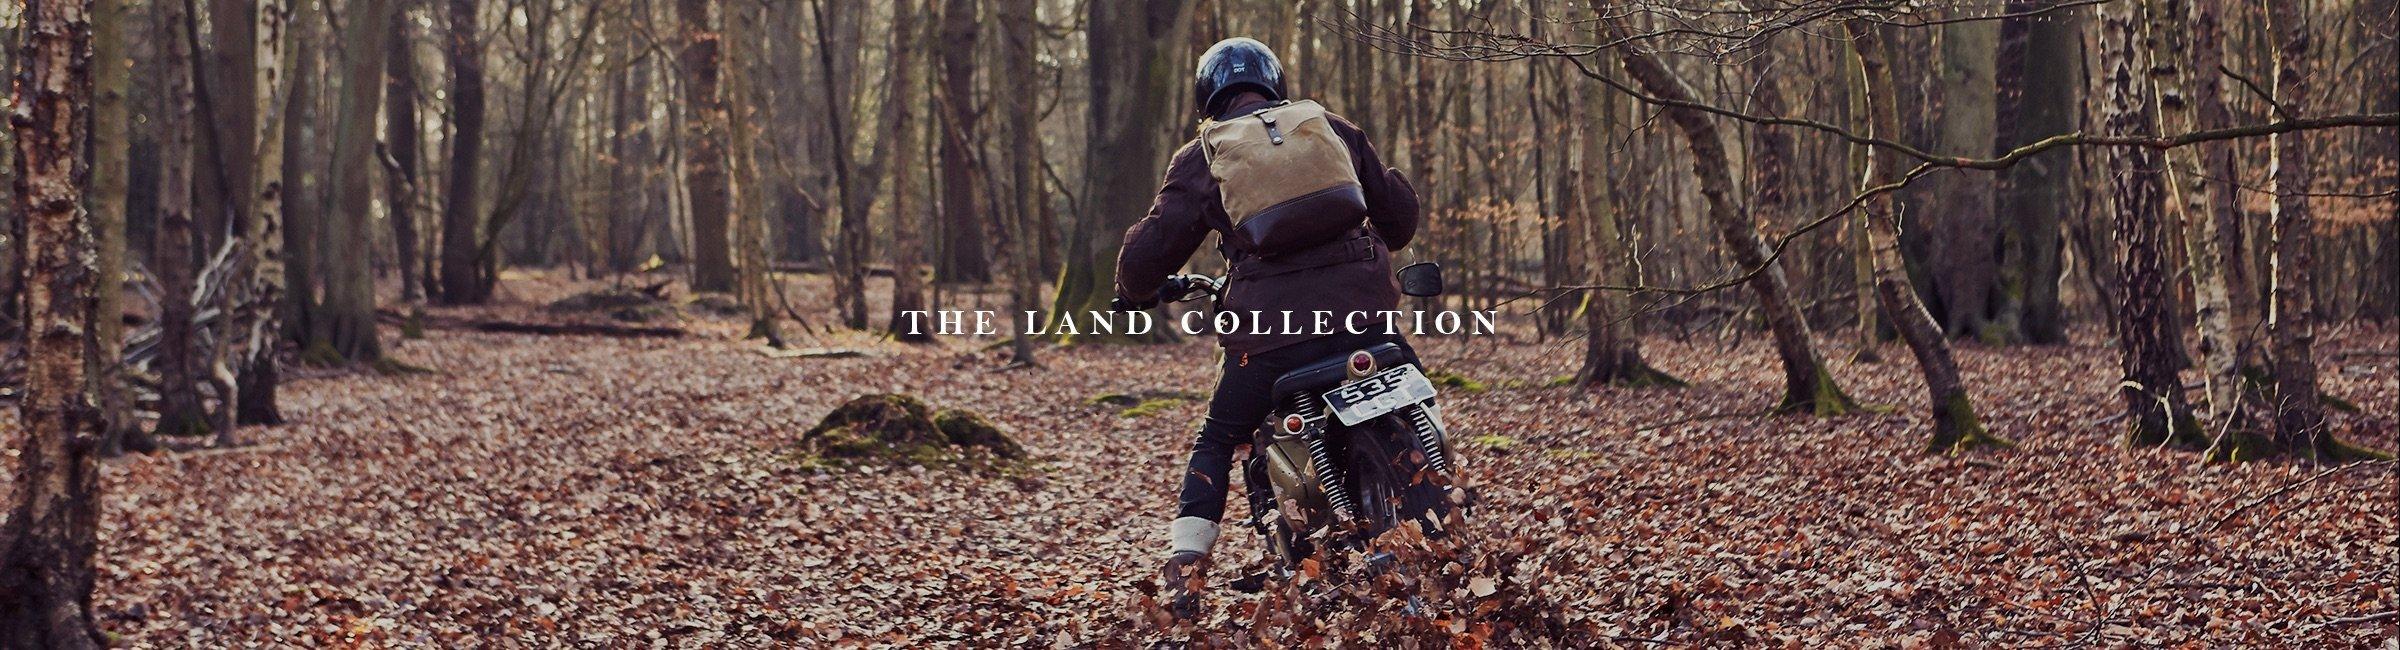 Land-collection-slider